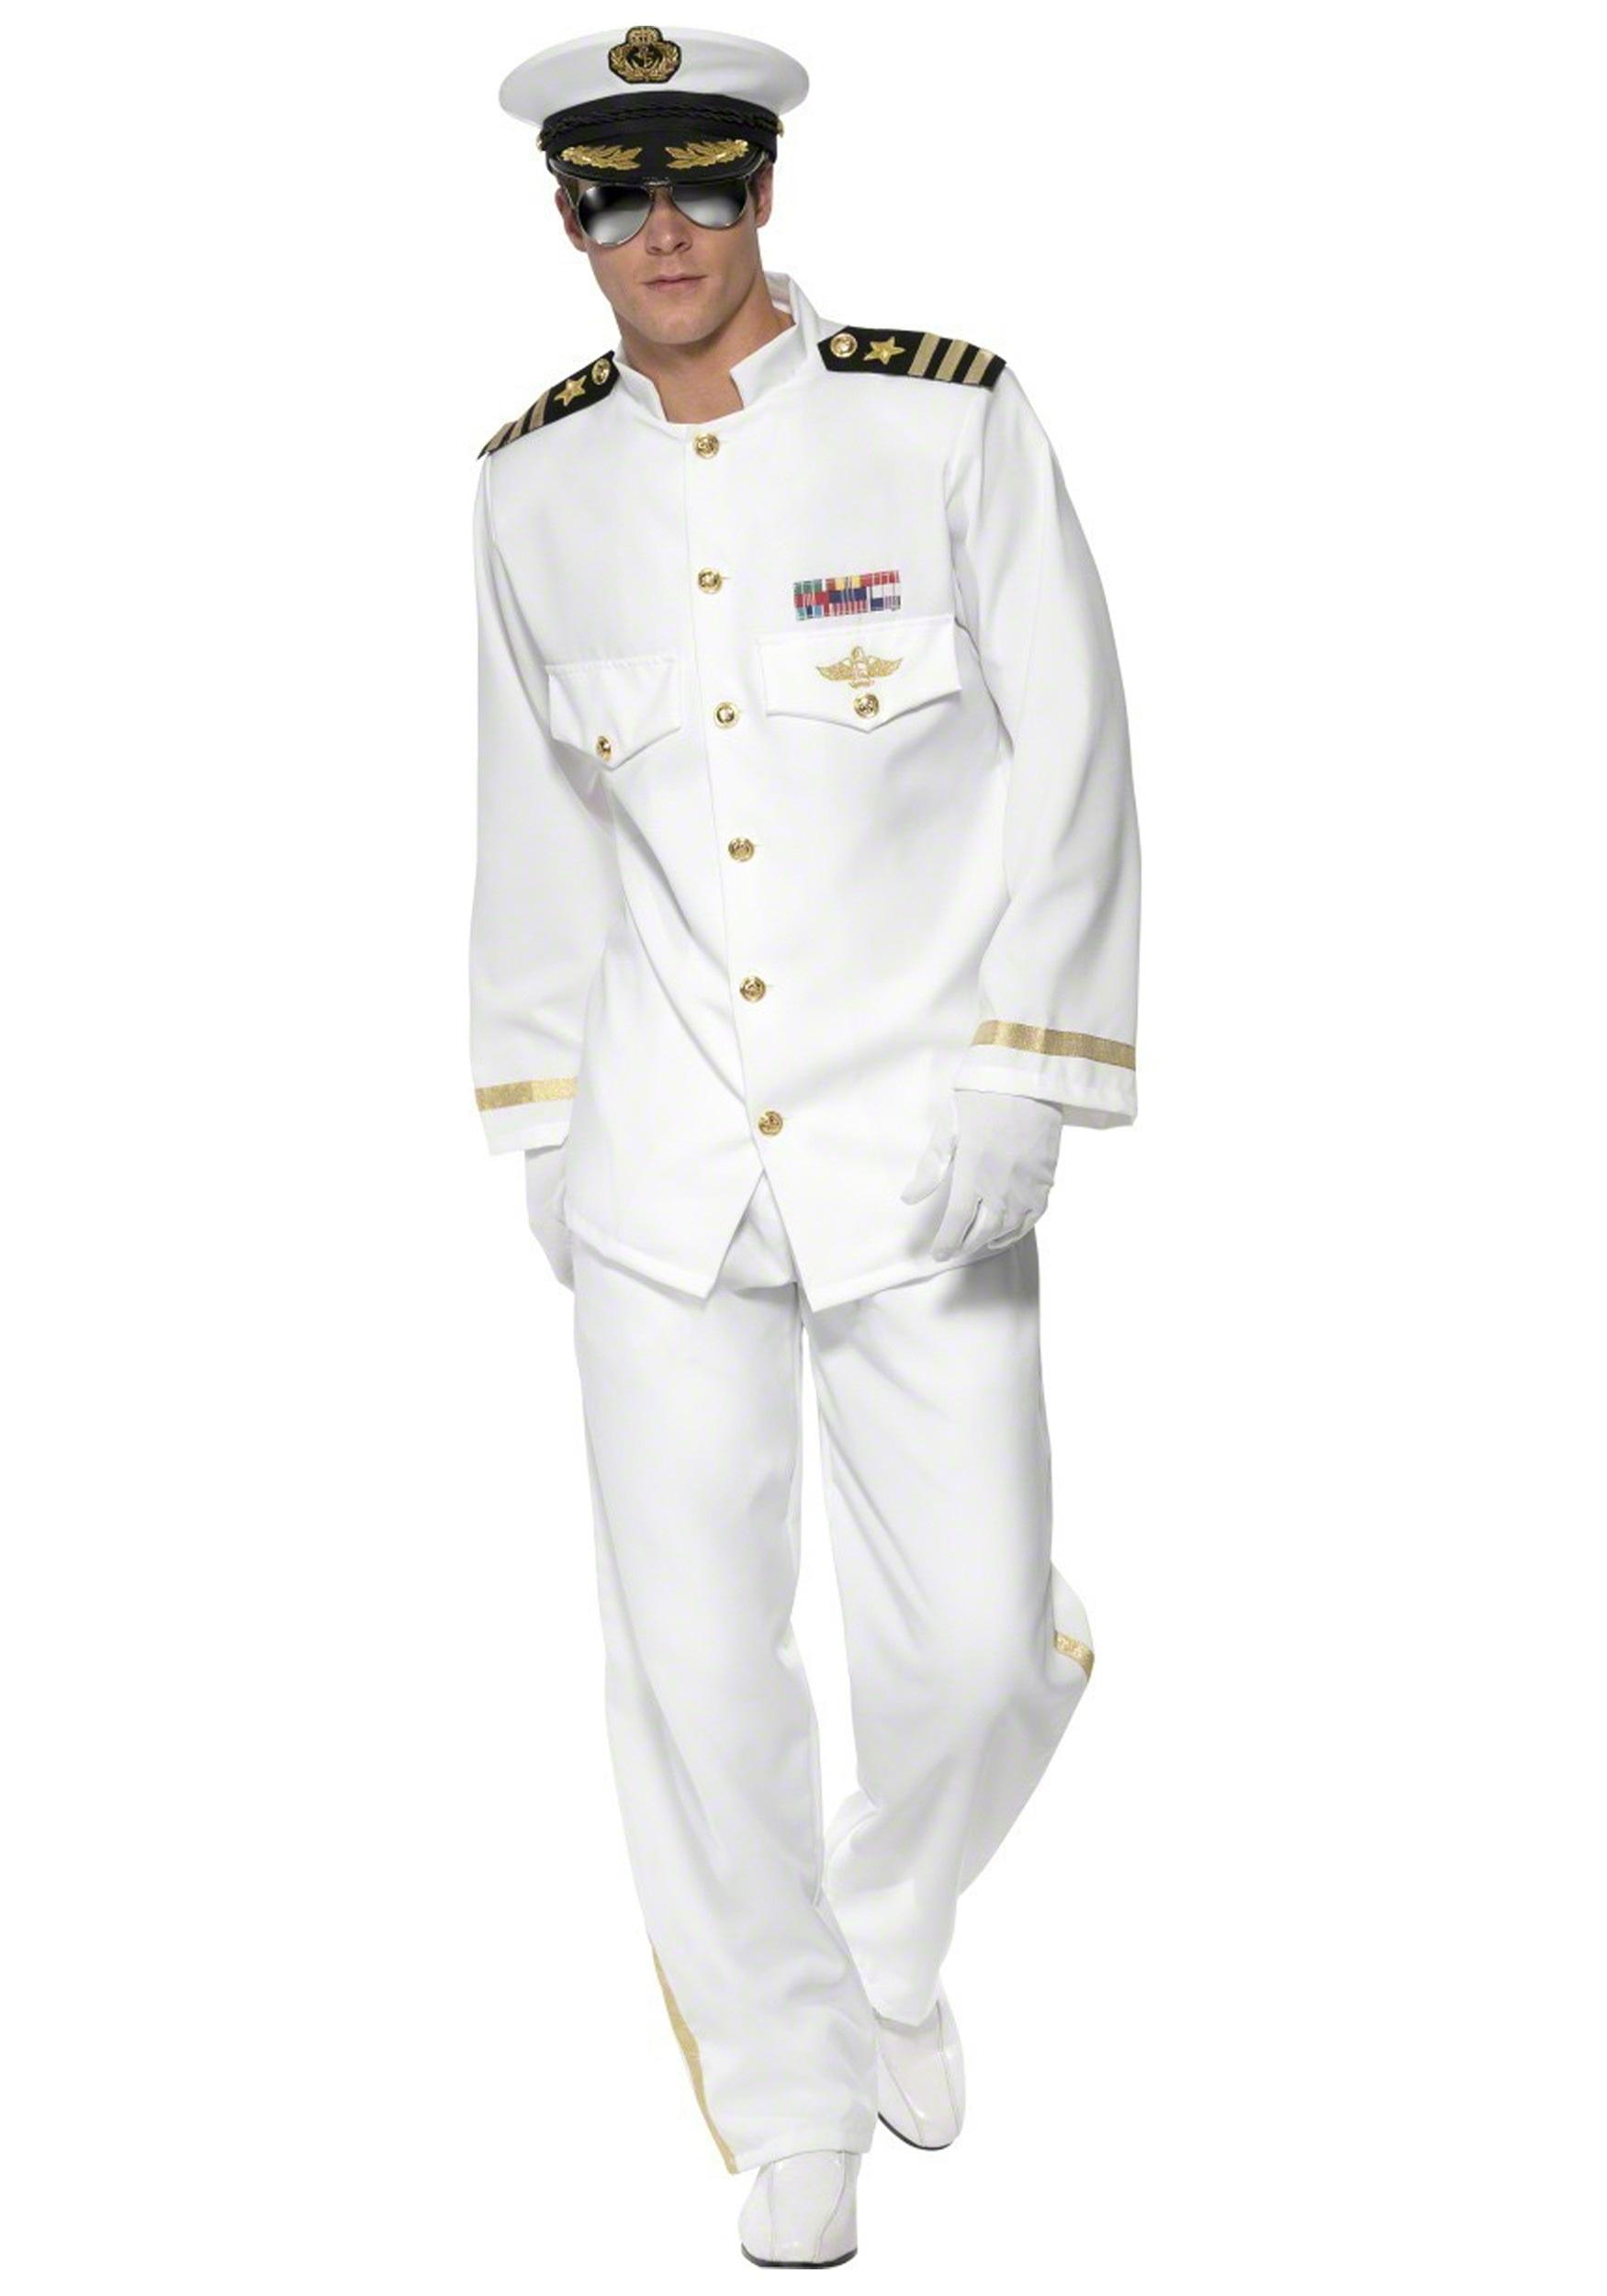 Cruise+ship+captain+costume